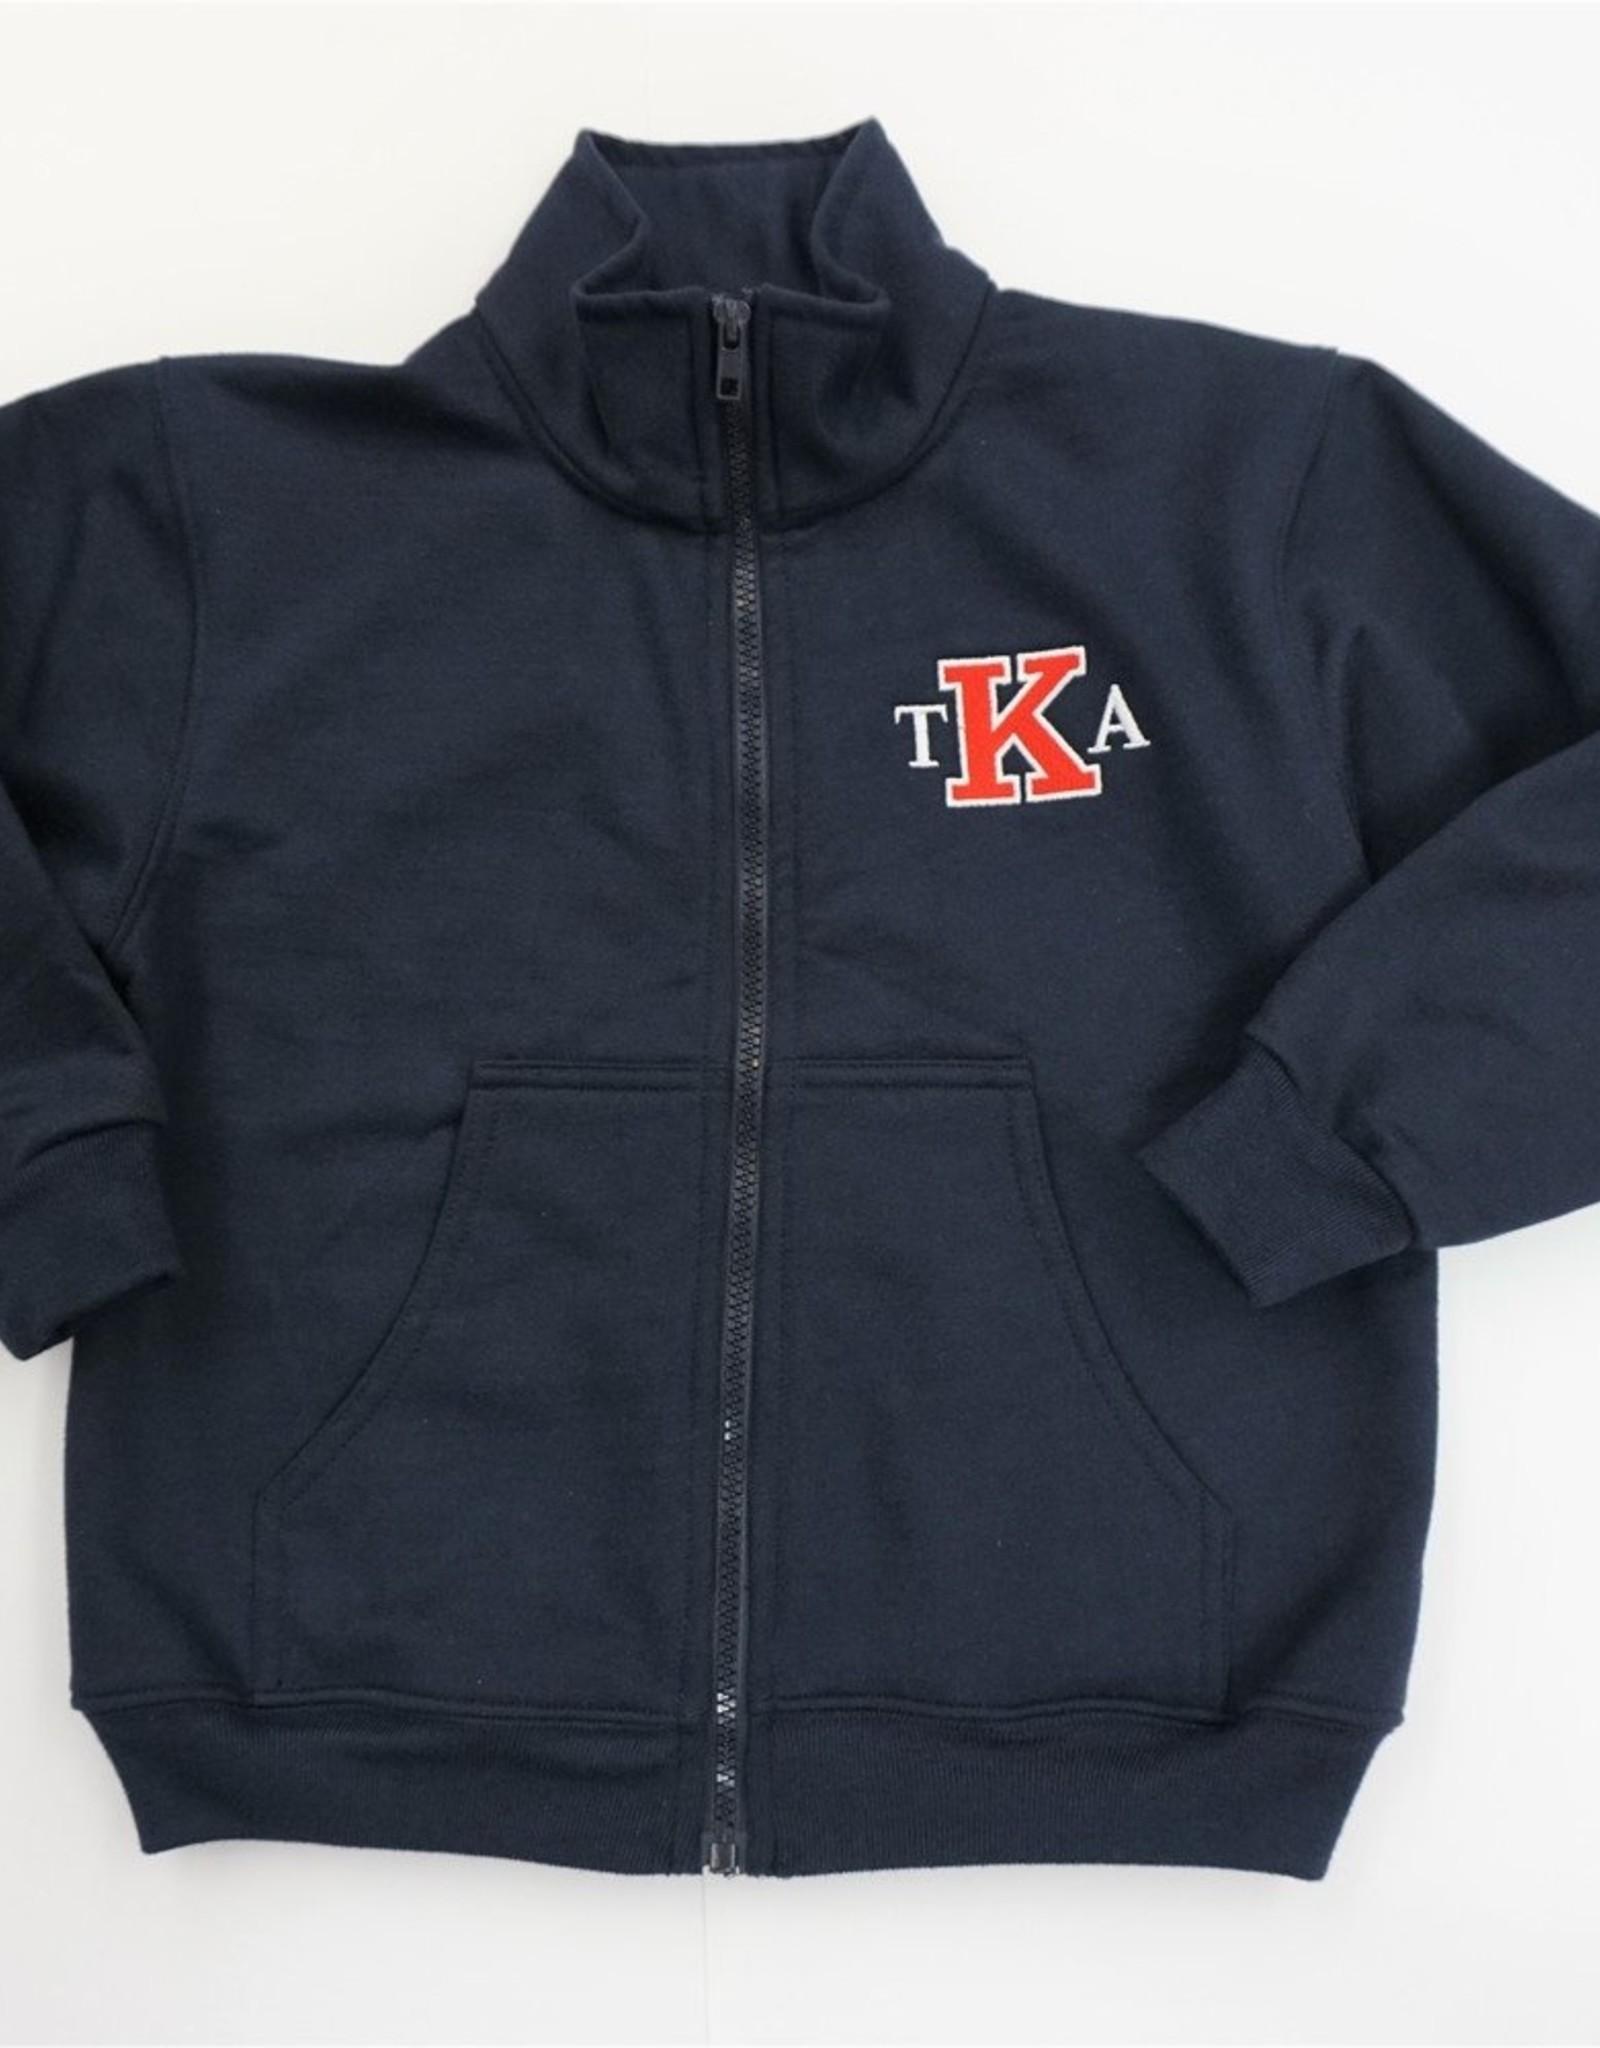 SunshineWear Navy Sweatshirt Jacket